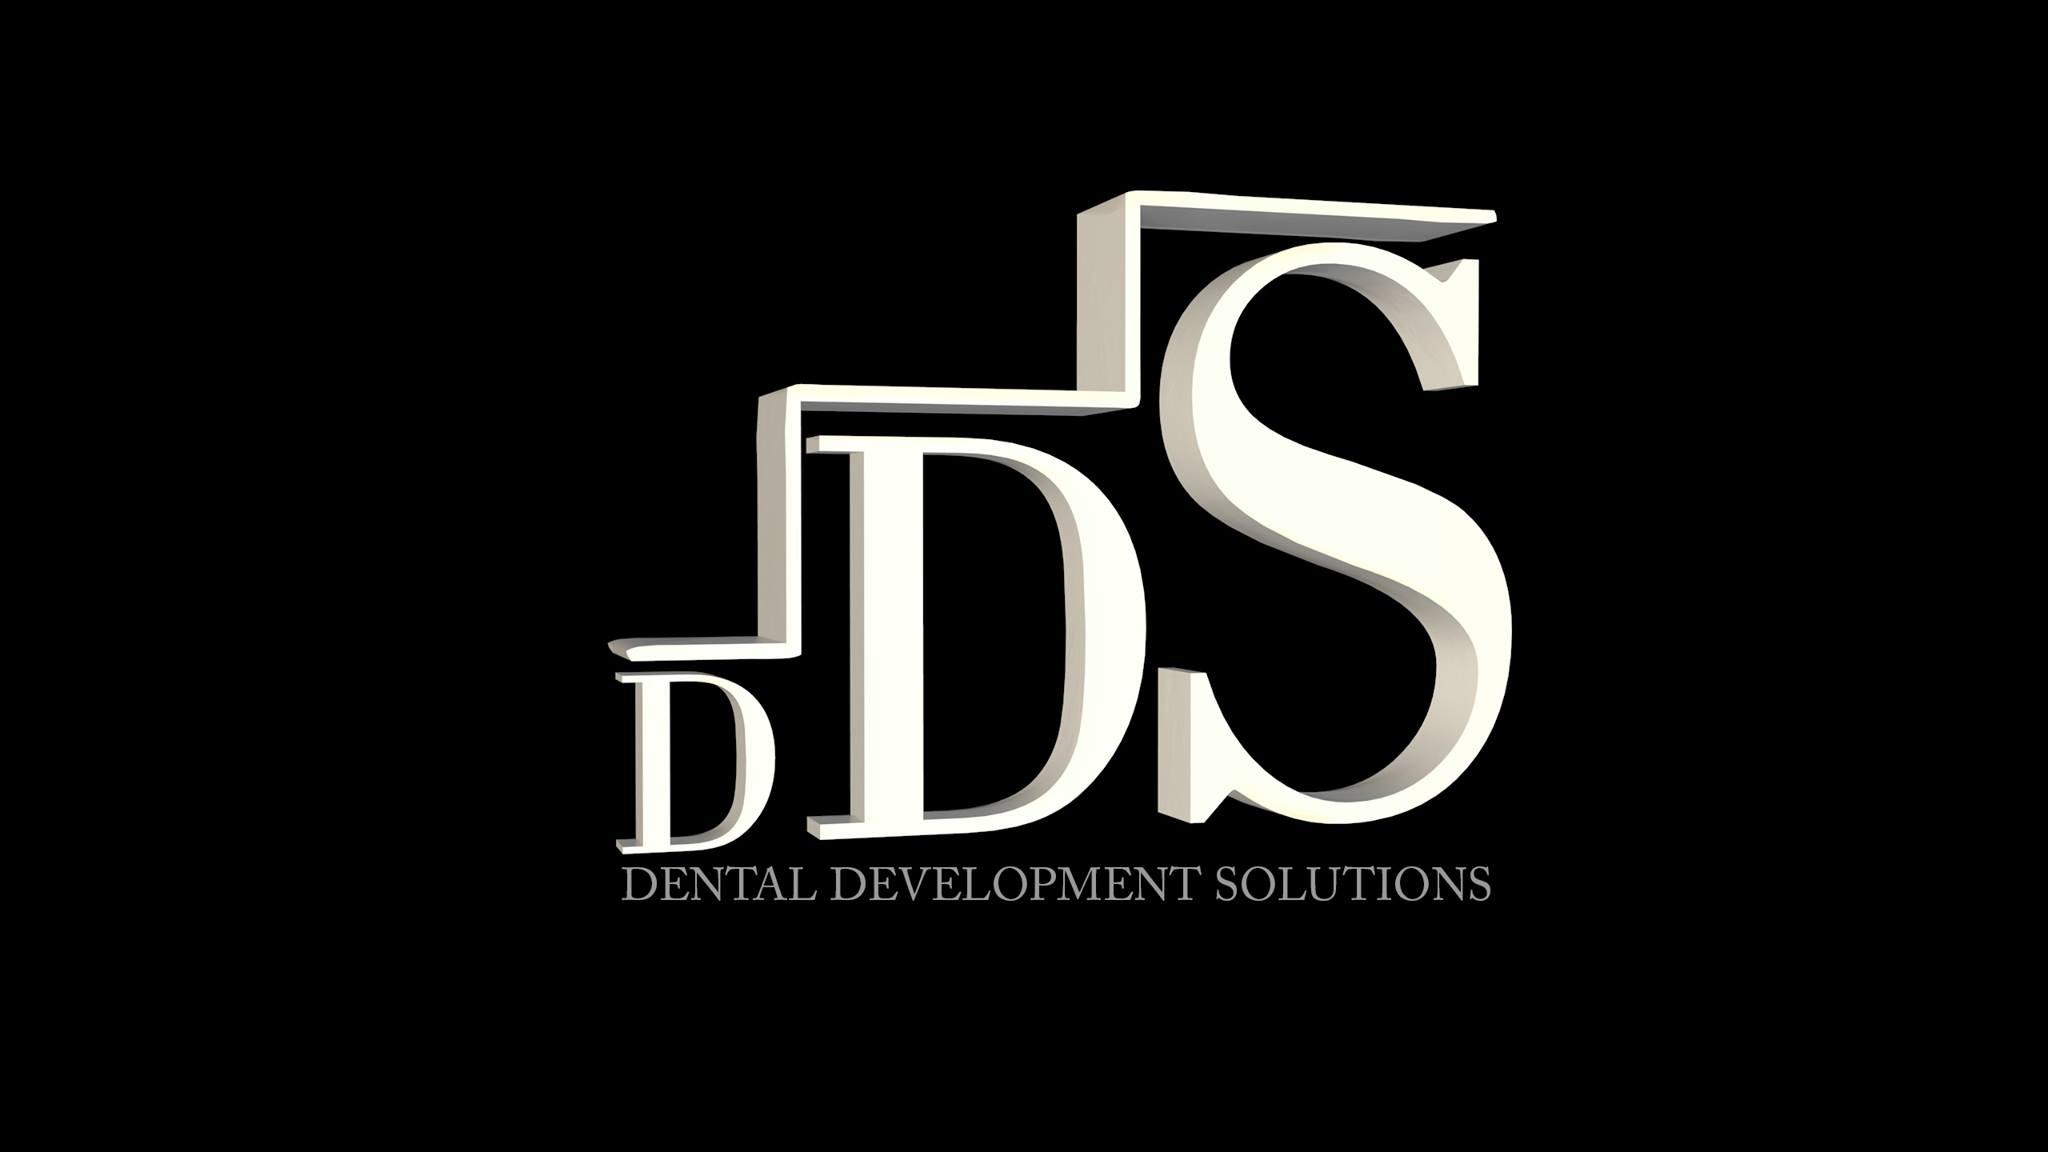 Logo Design by Chok Rivera - Entry No. 31 in the Logo Design Contest Unique Logo Design Wanted for DDS: Dental Development Solutions.